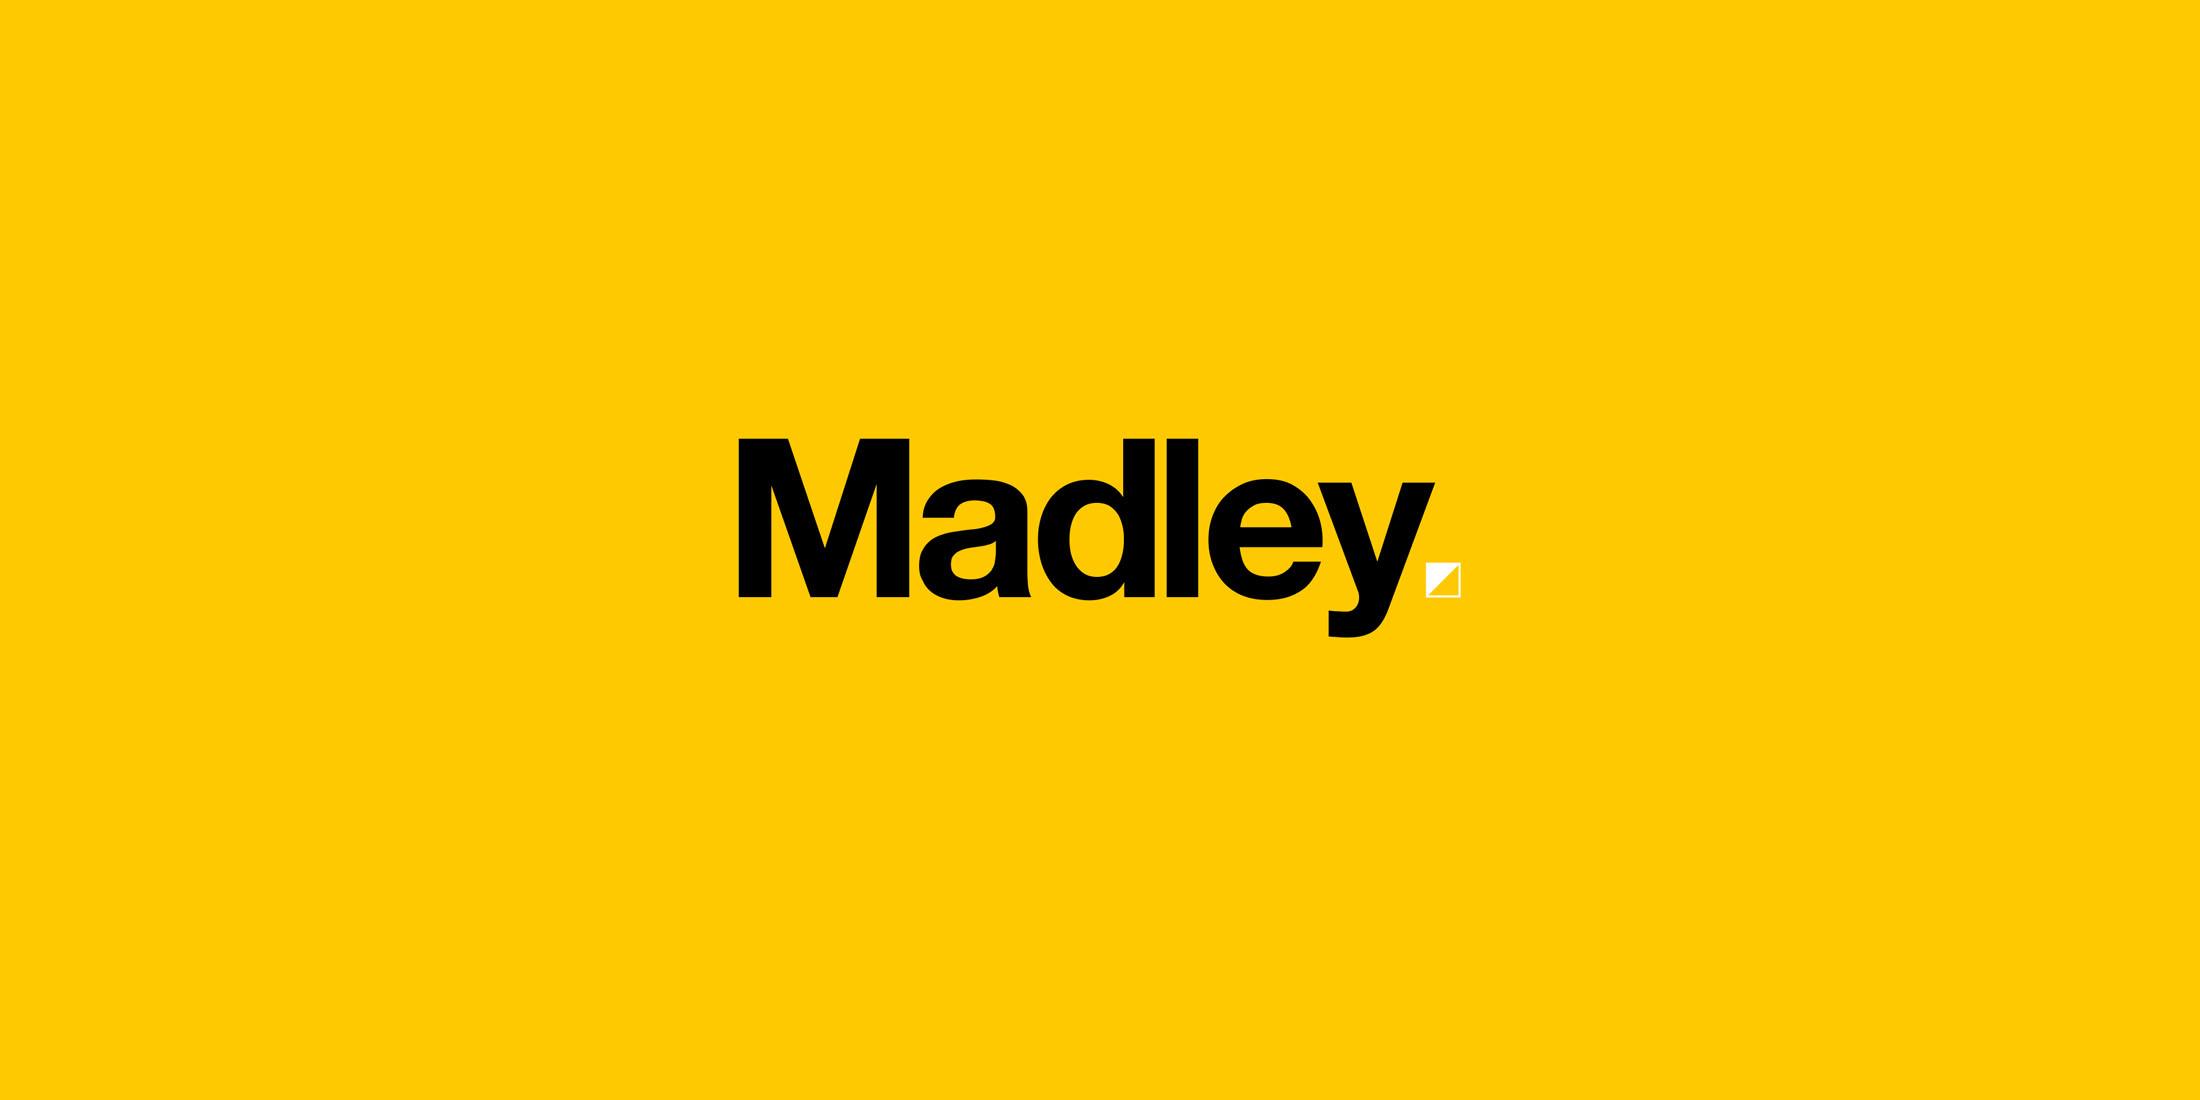 Madley logo